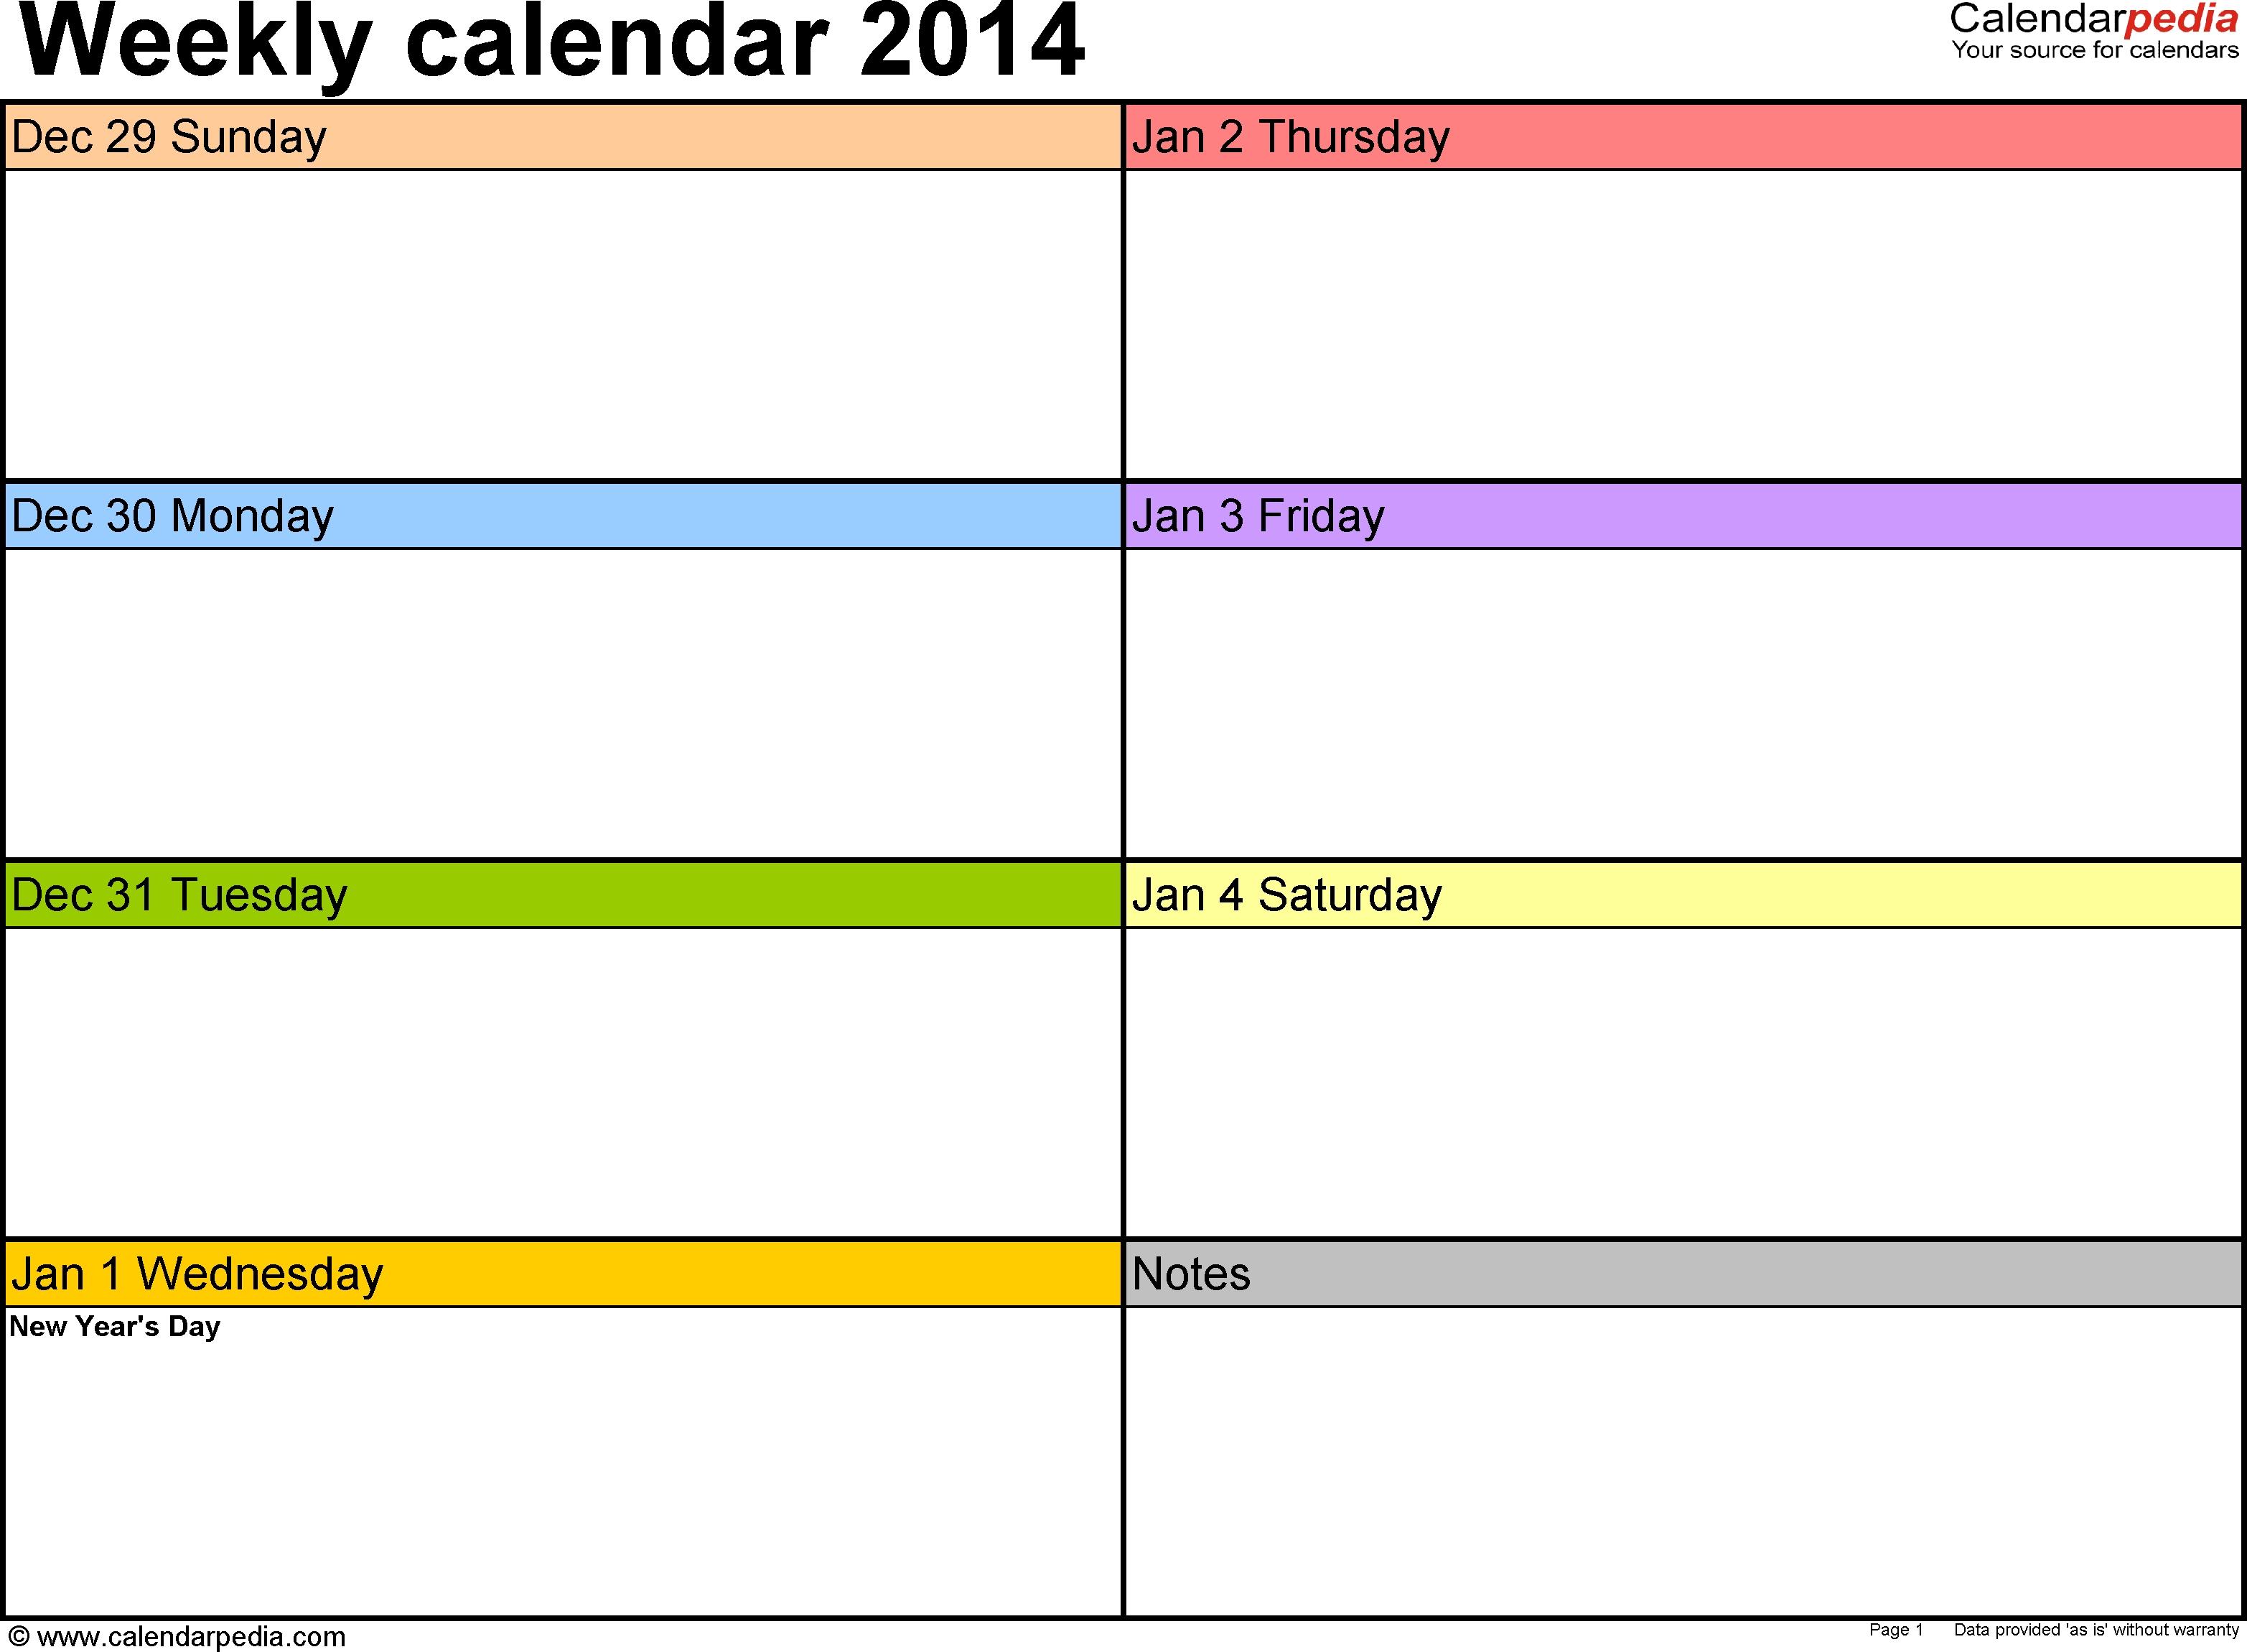 Weekly Calendar 2014 For Pdf - 4 Free Printable Templates-Printable 2 Week Blank Calendar Template